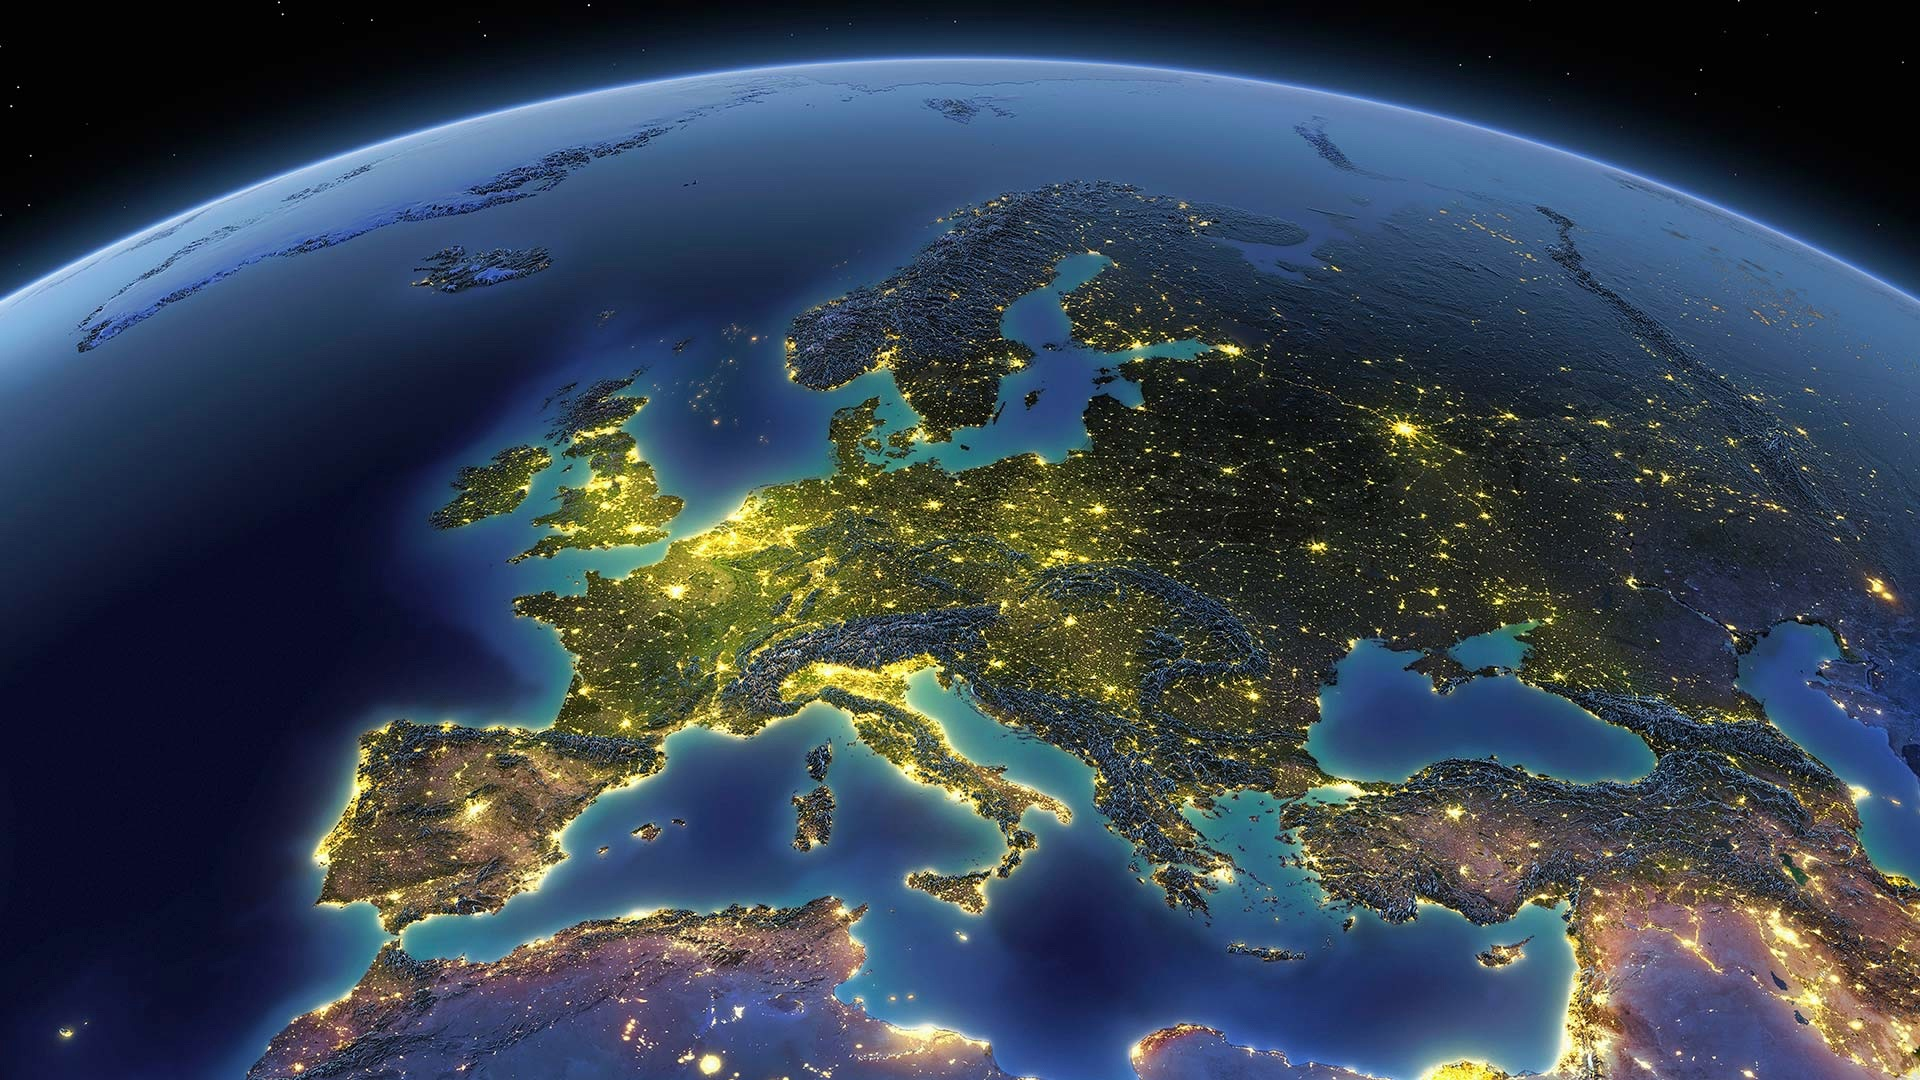 Fonds D Ecran Terre Planete Espace Europe Mer